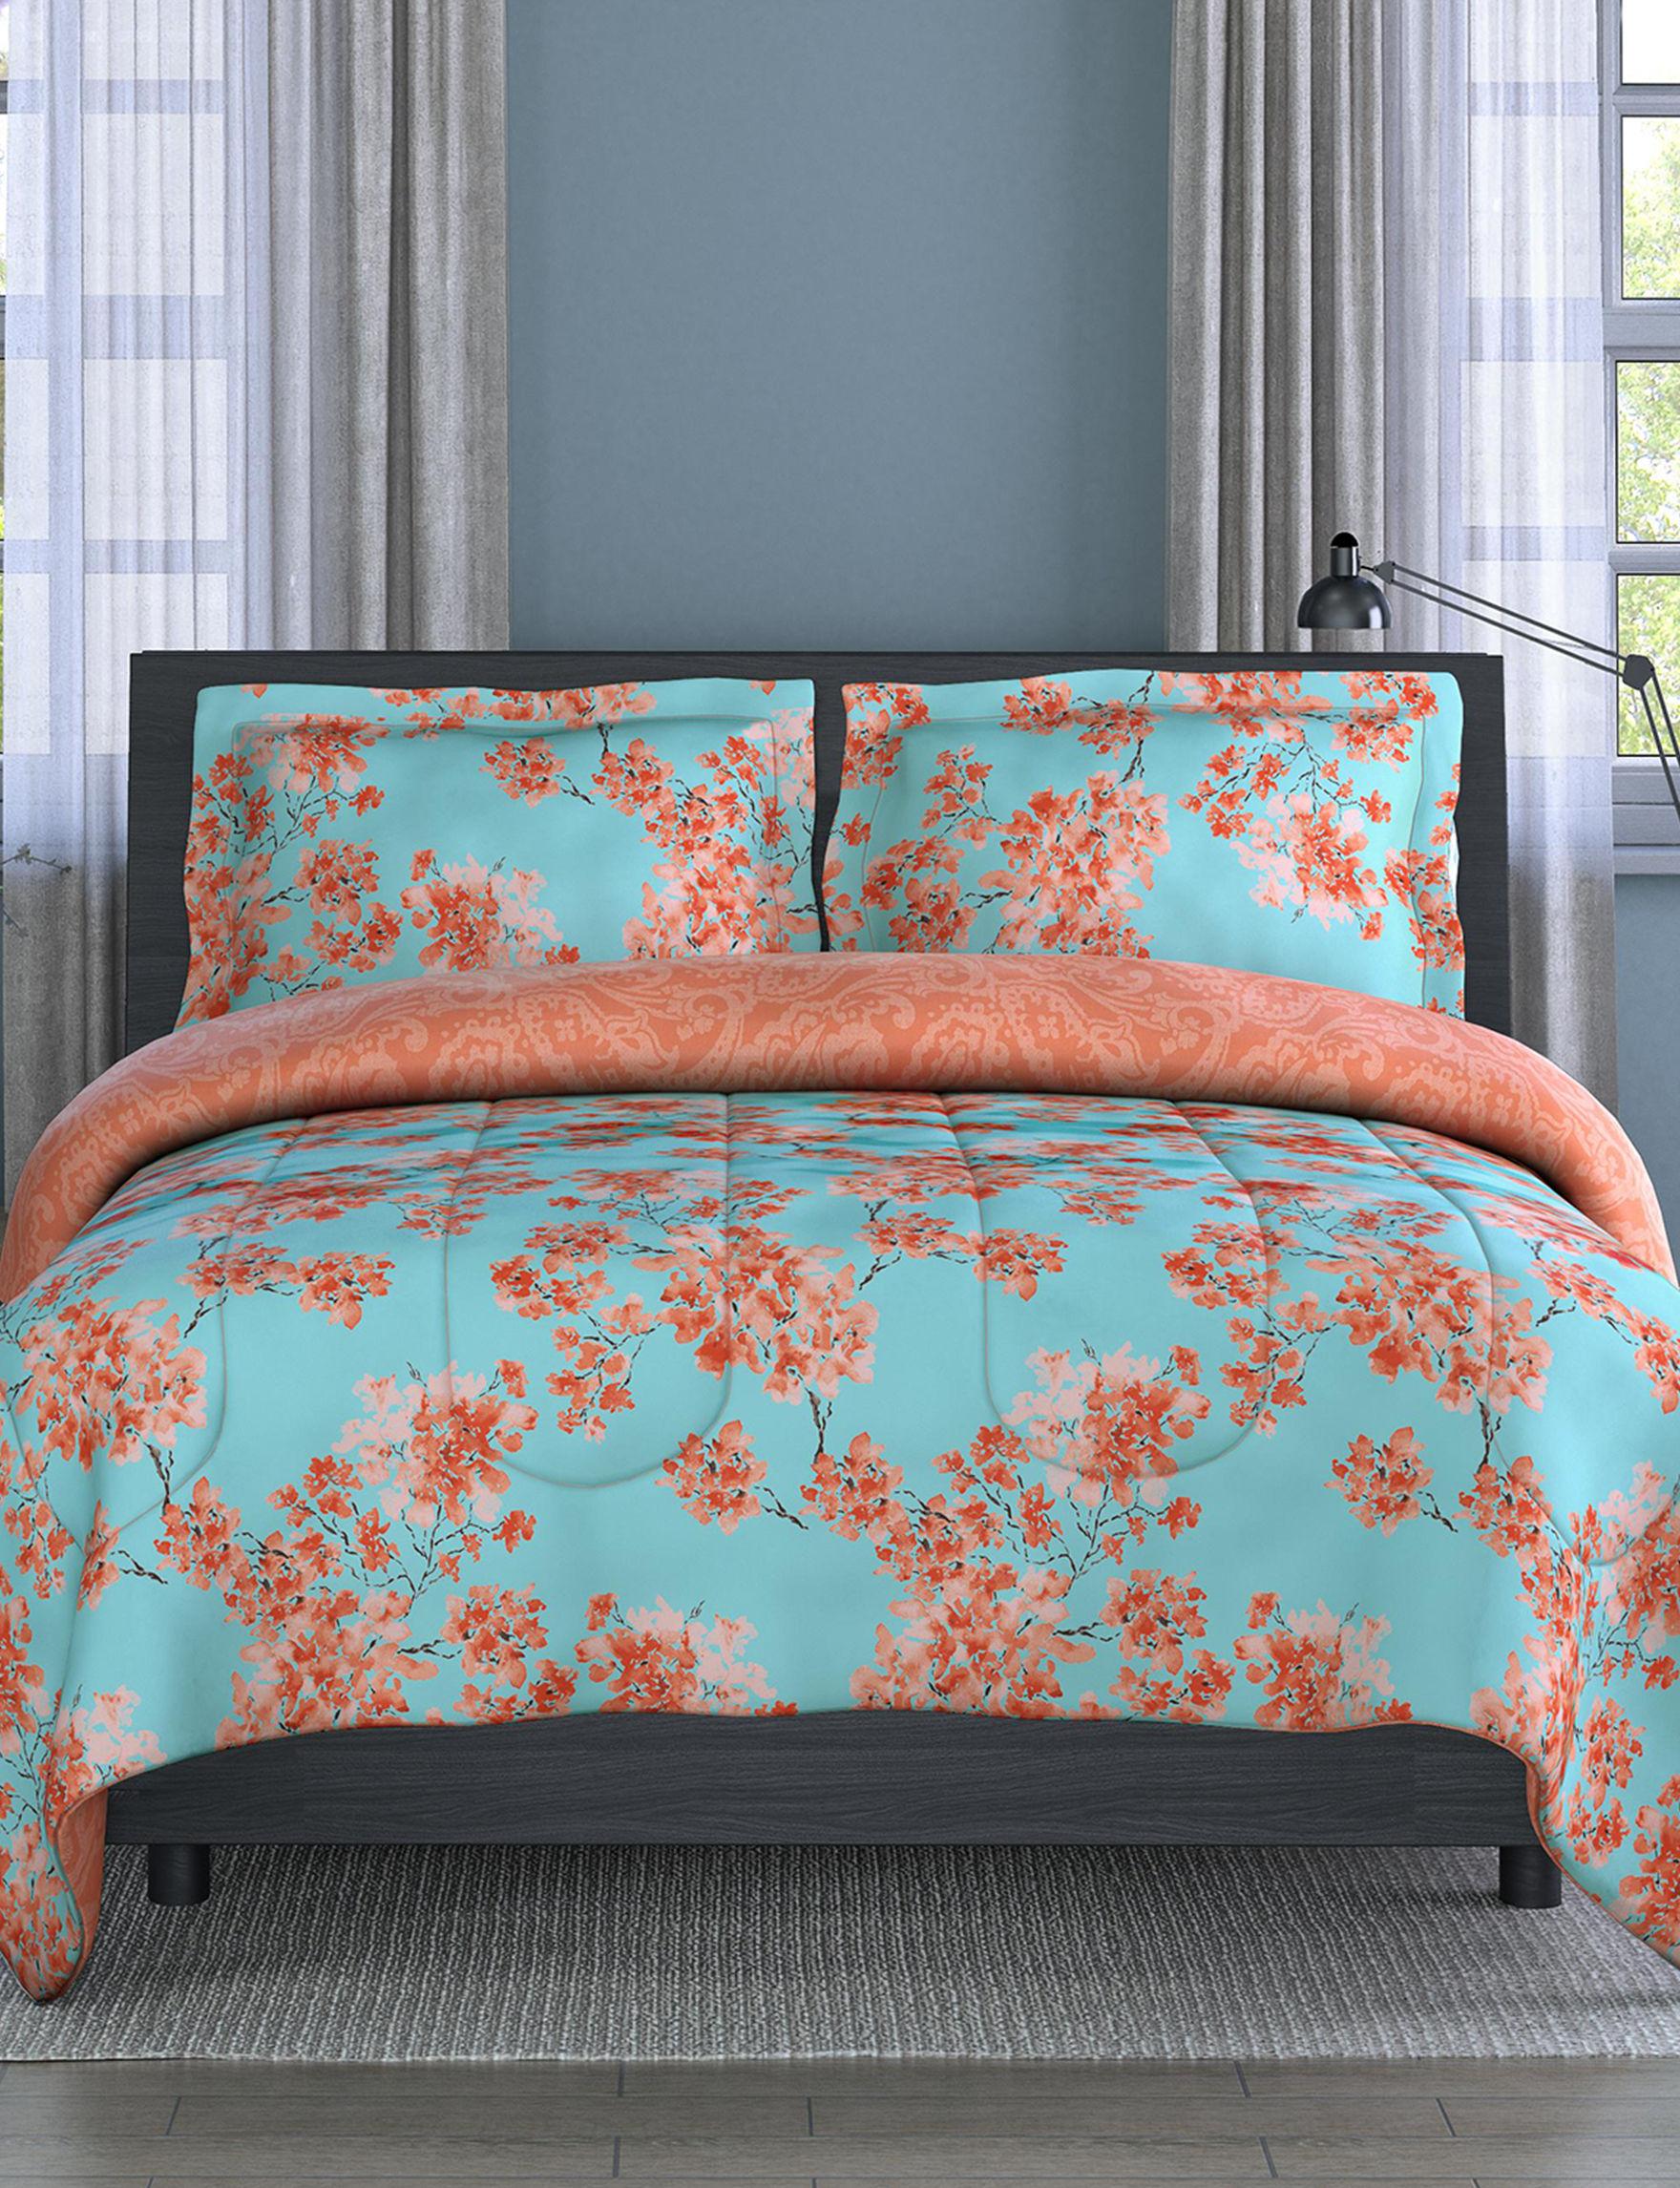 Inspired Surroundings Teal Comforters & Comforter Sets